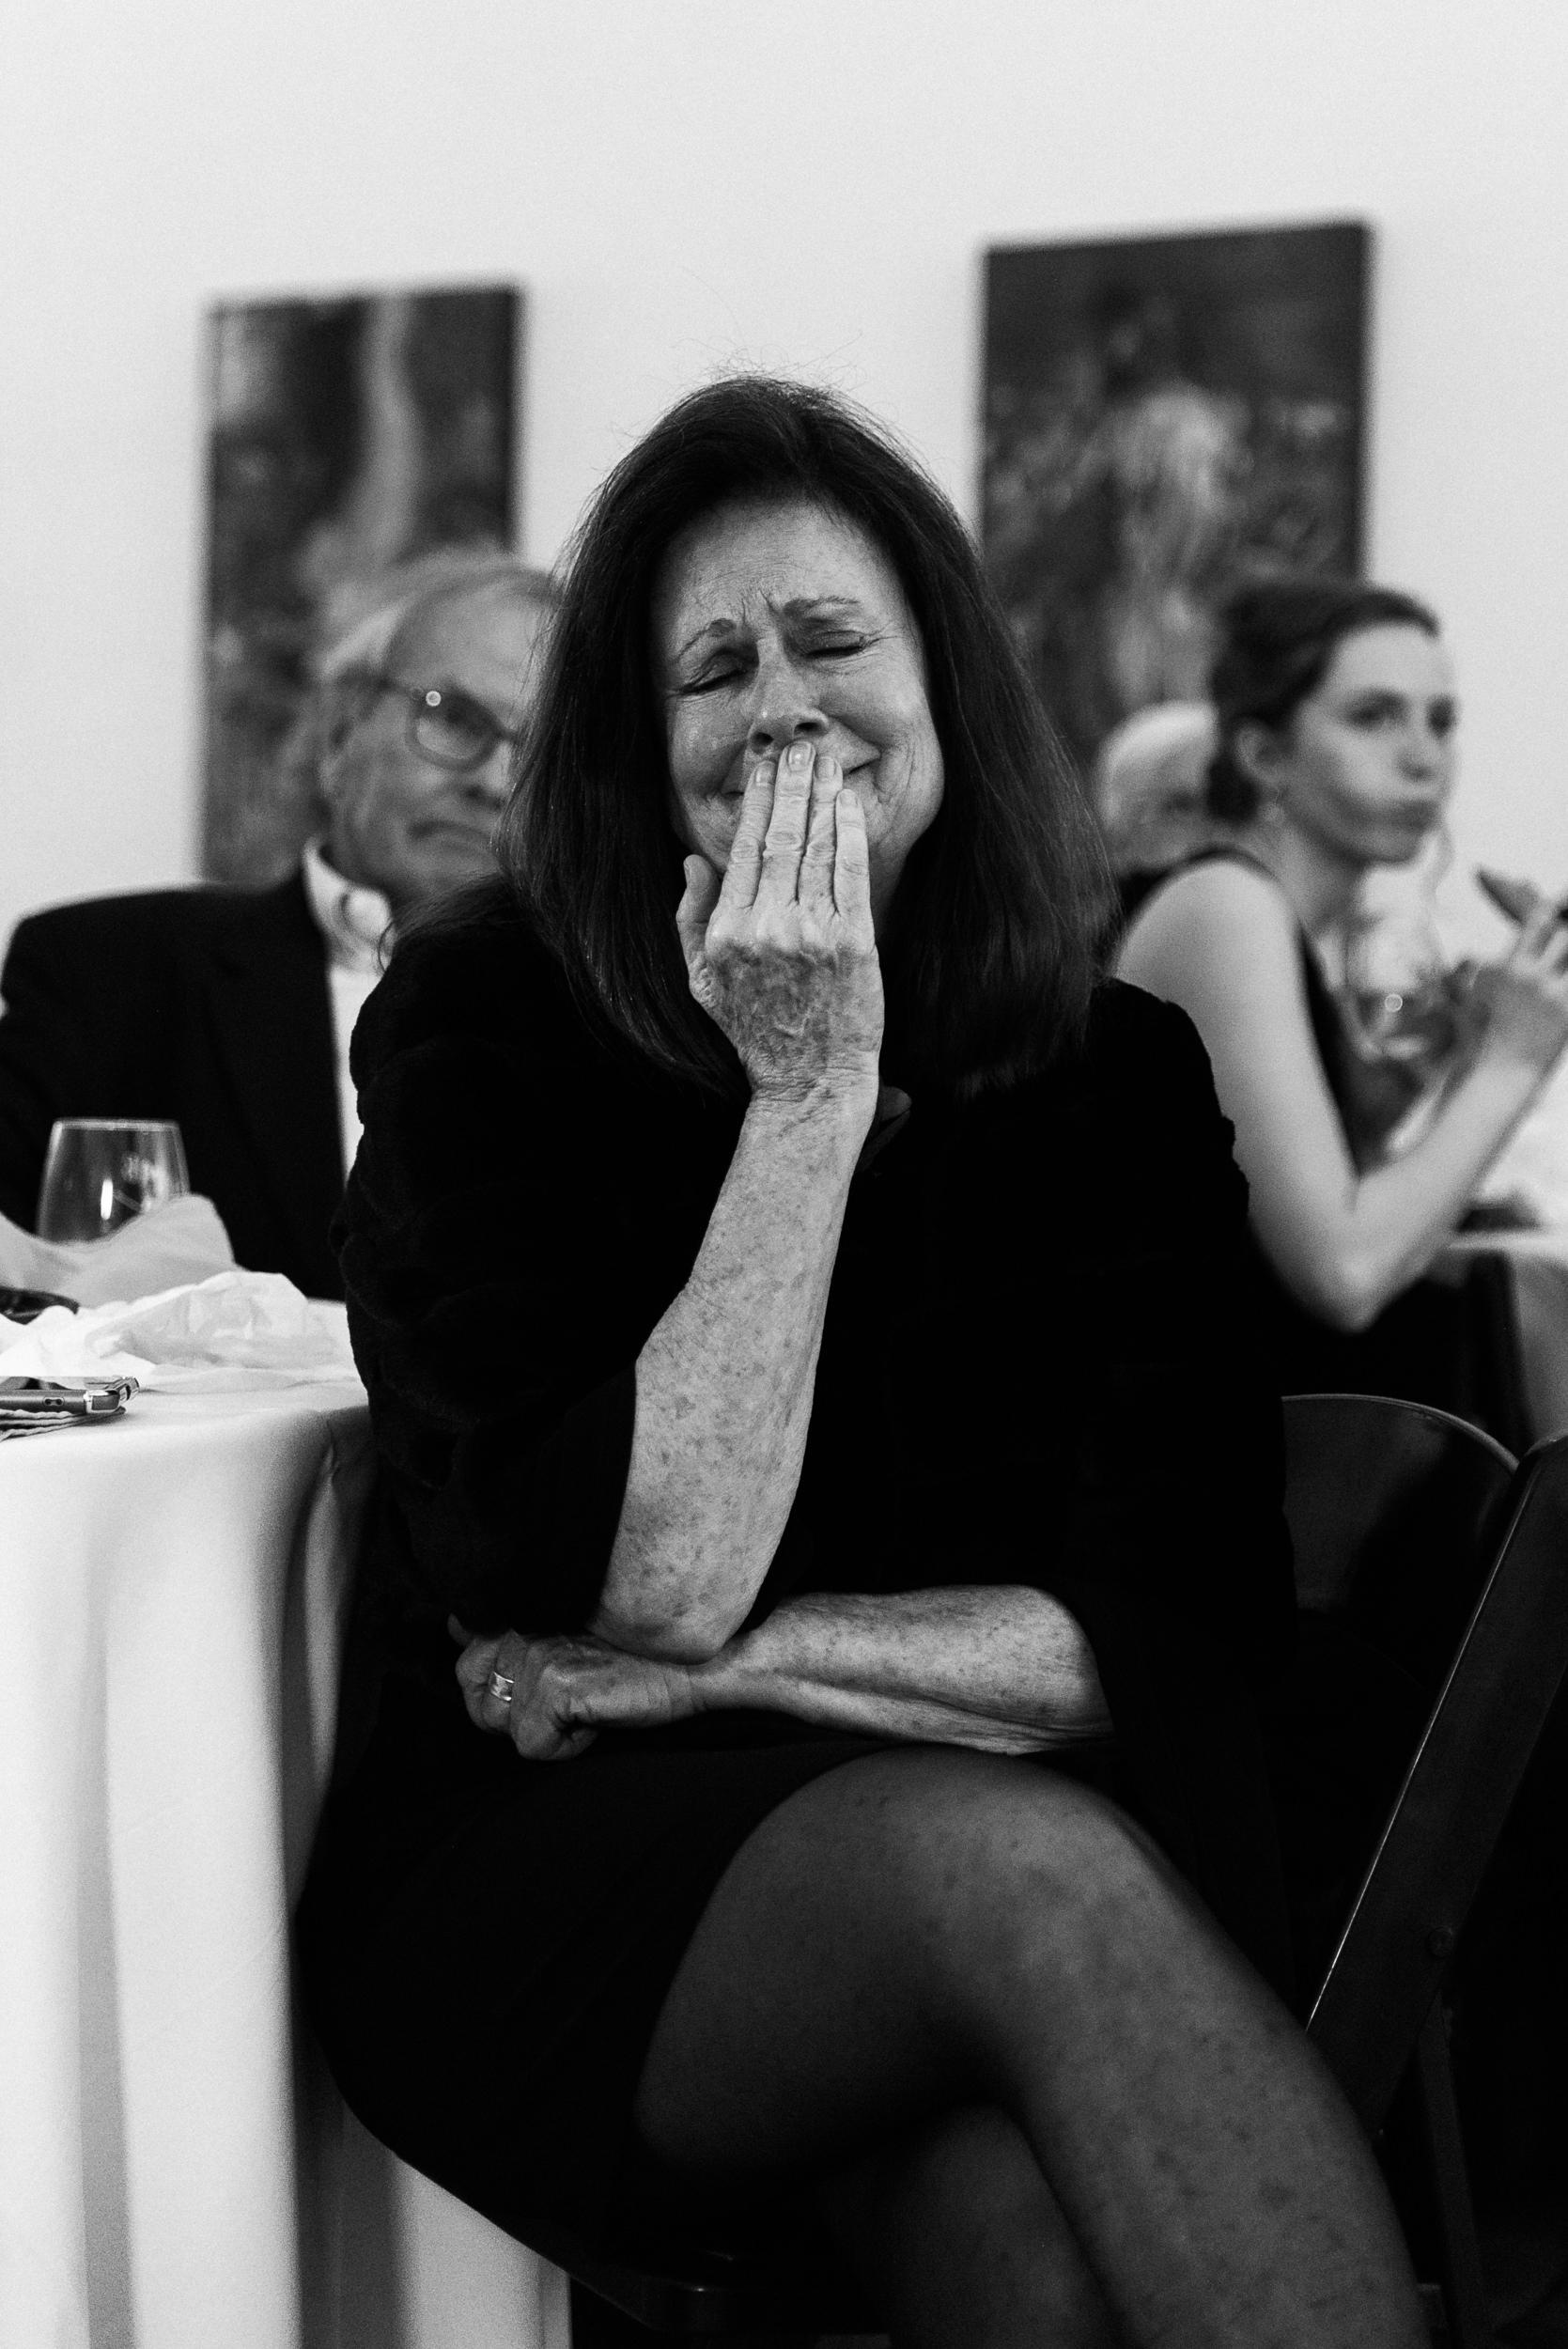 Emotions running very high at Colorado's Space Gallery wedding-Denver Wedding Photographer